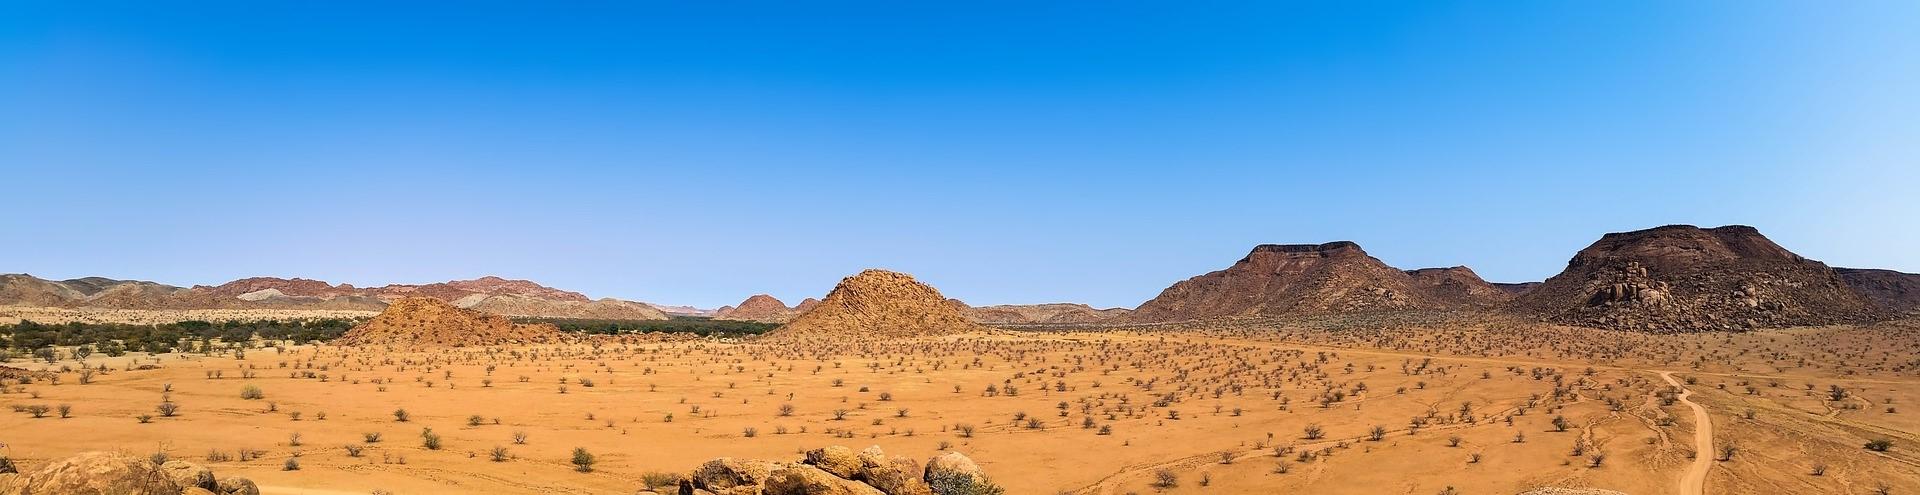 destinos-abril-namibia